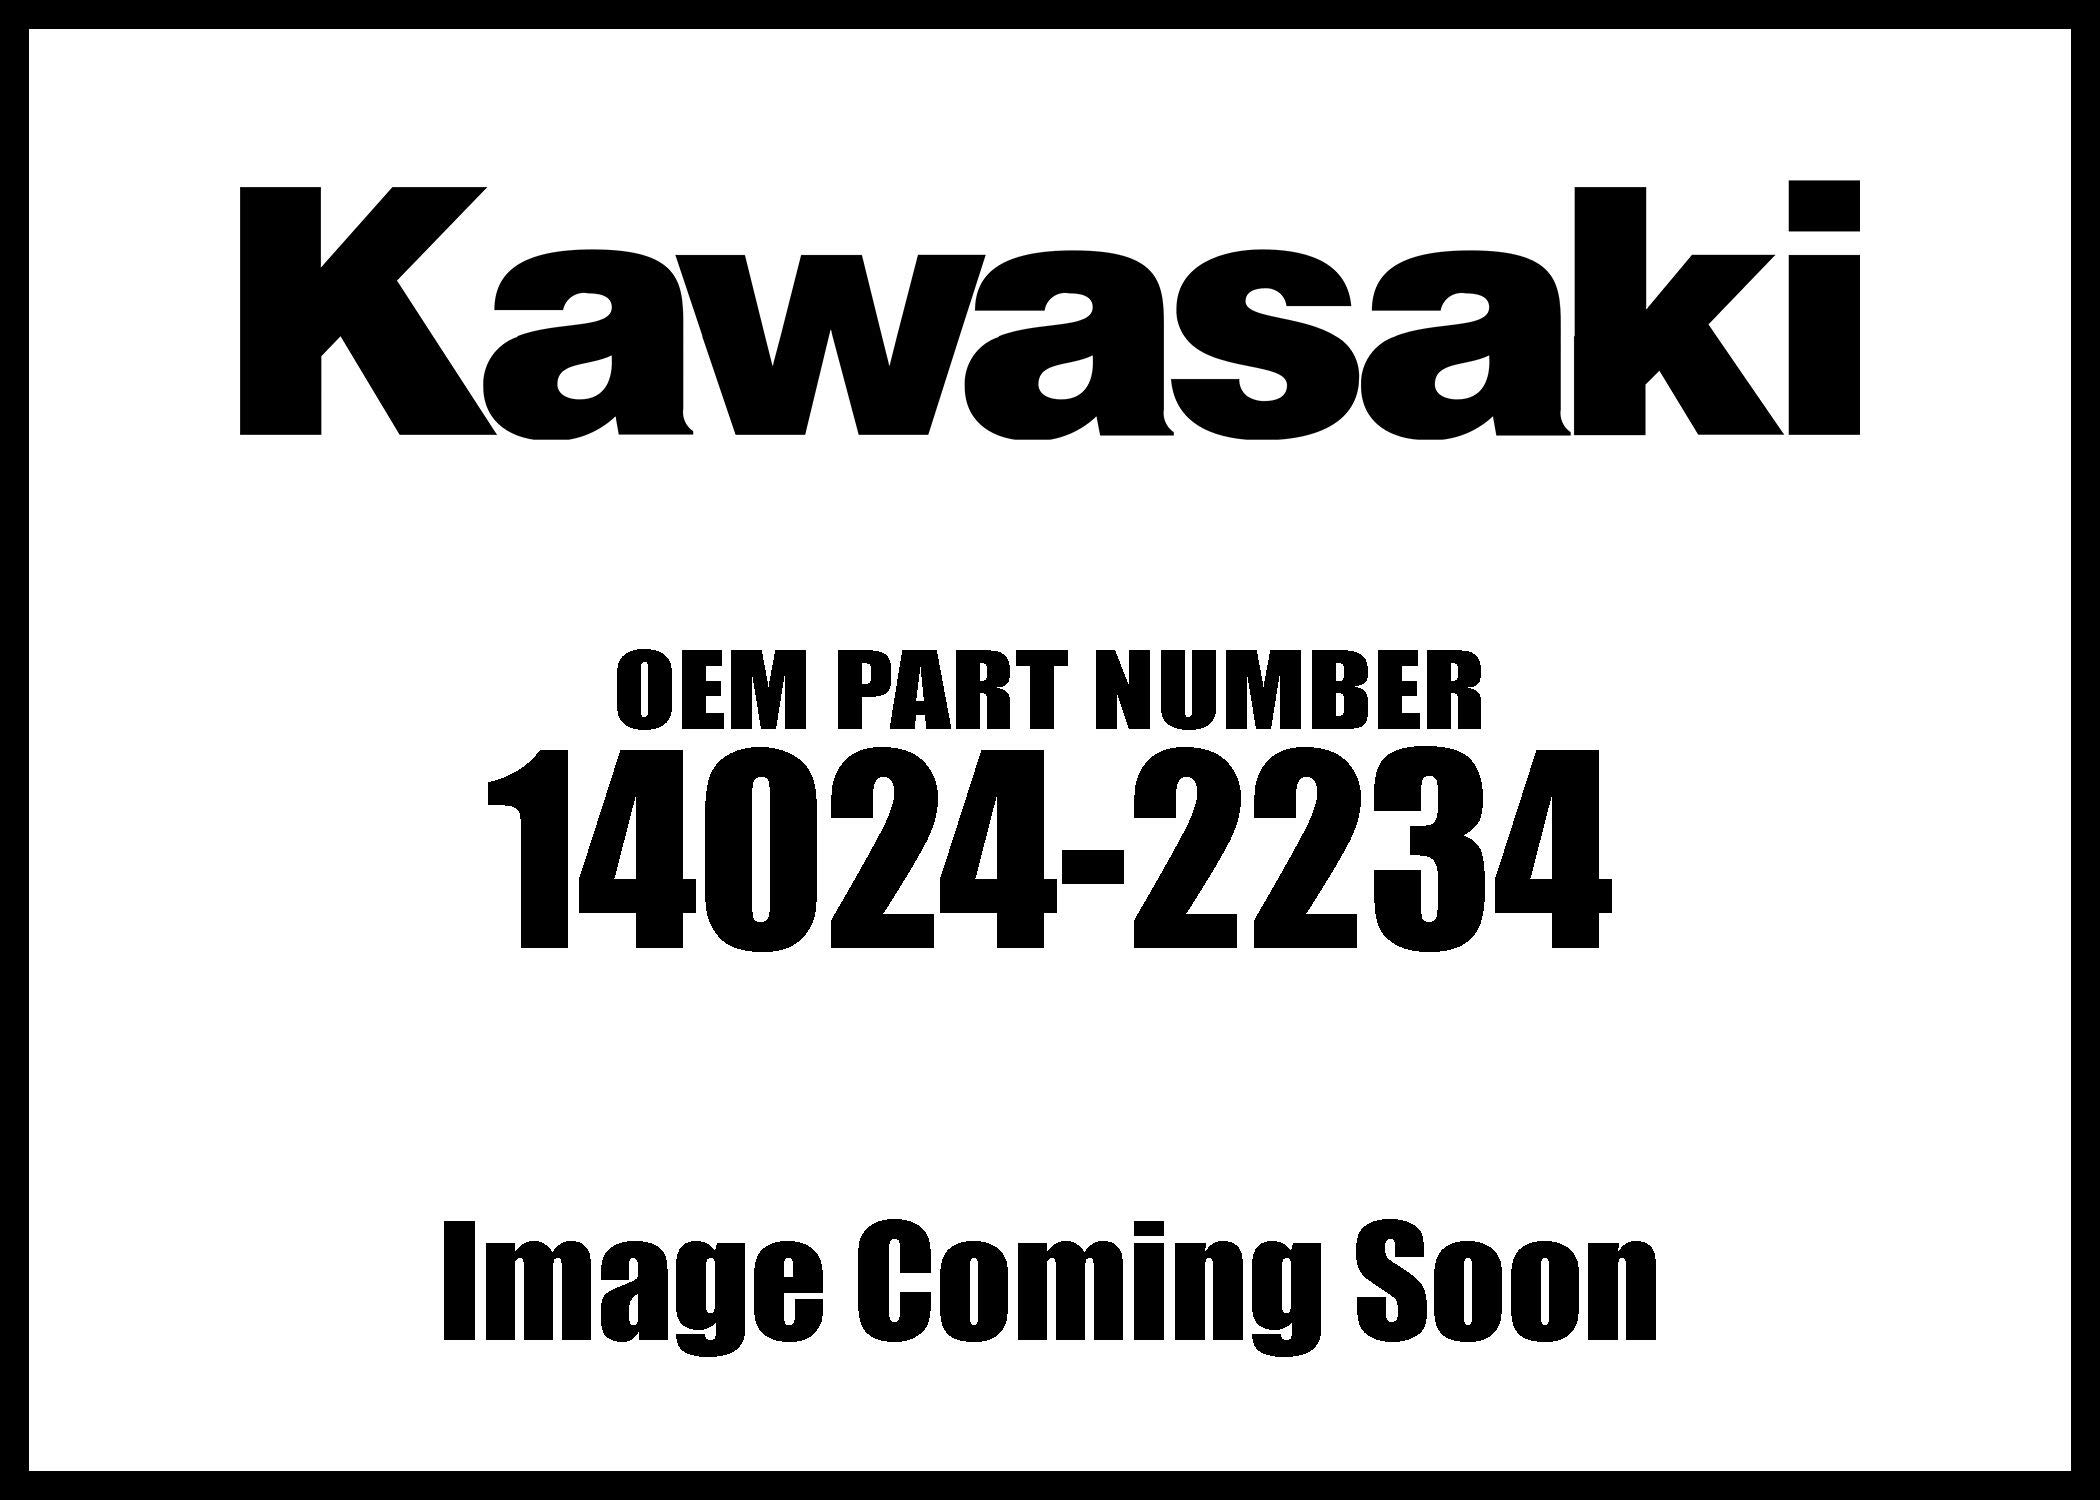 Kawasaki 1991-2004 Mule 500 Mule 520 Cover 14024-2234 New Oem